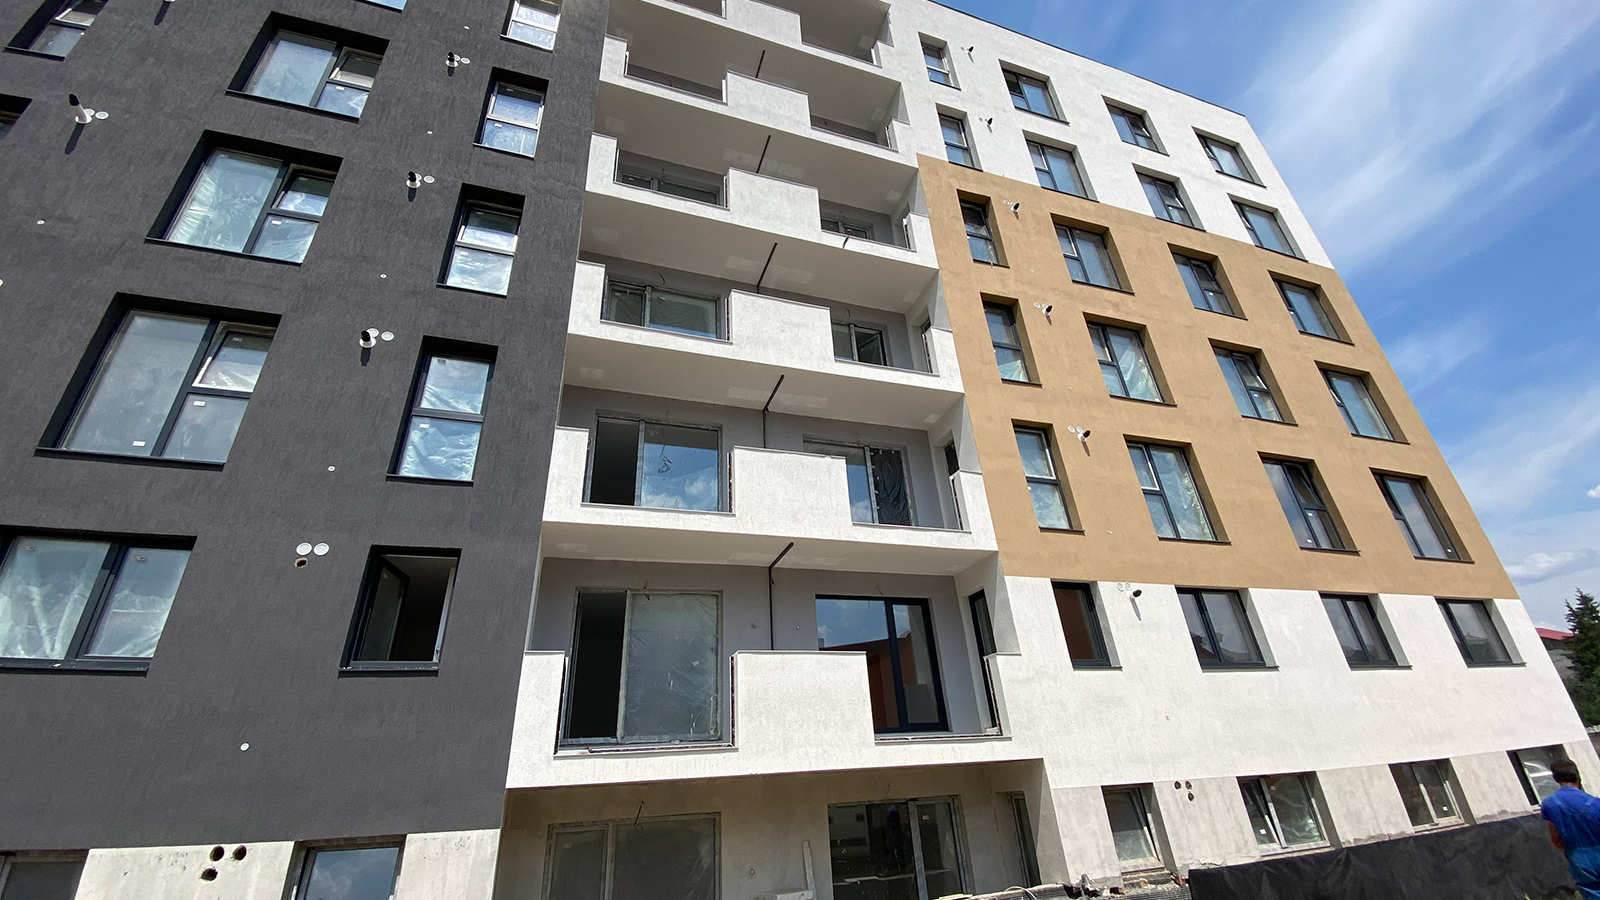 Stadiu executie Uverturii Residence 8 Iulie 2020 - Apartamente si garsoniere de vanzare Militari, Gorjului - 1